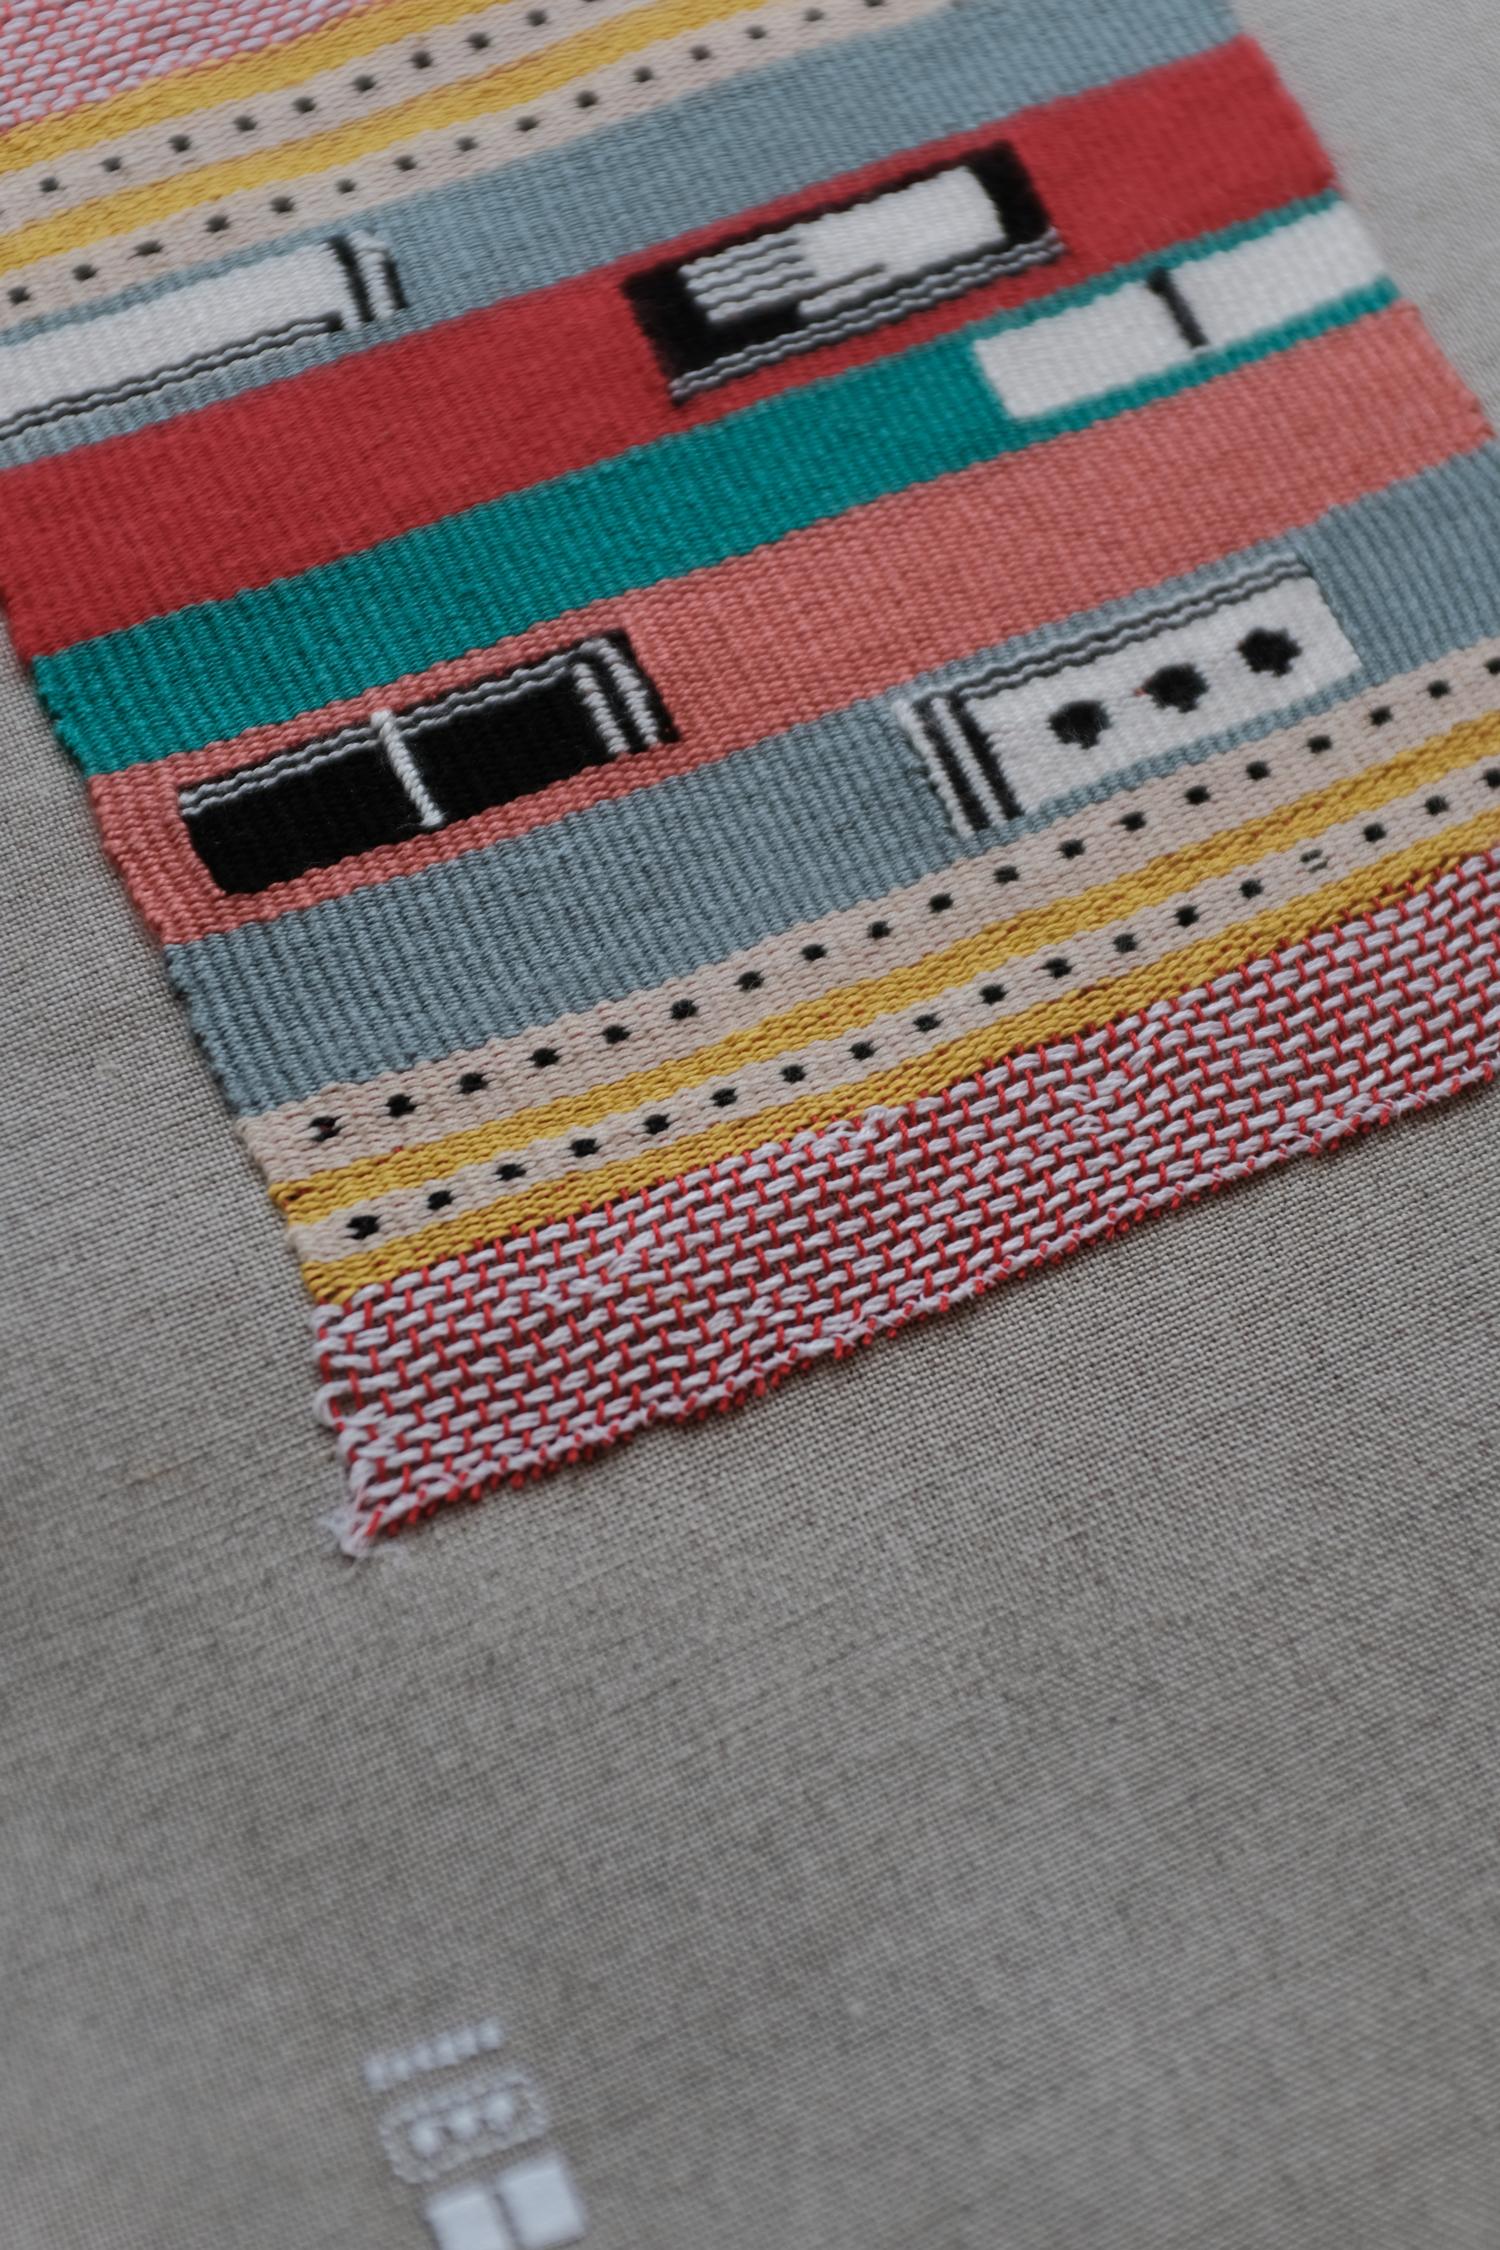 Baja Weaving series – A Well Travelled Book